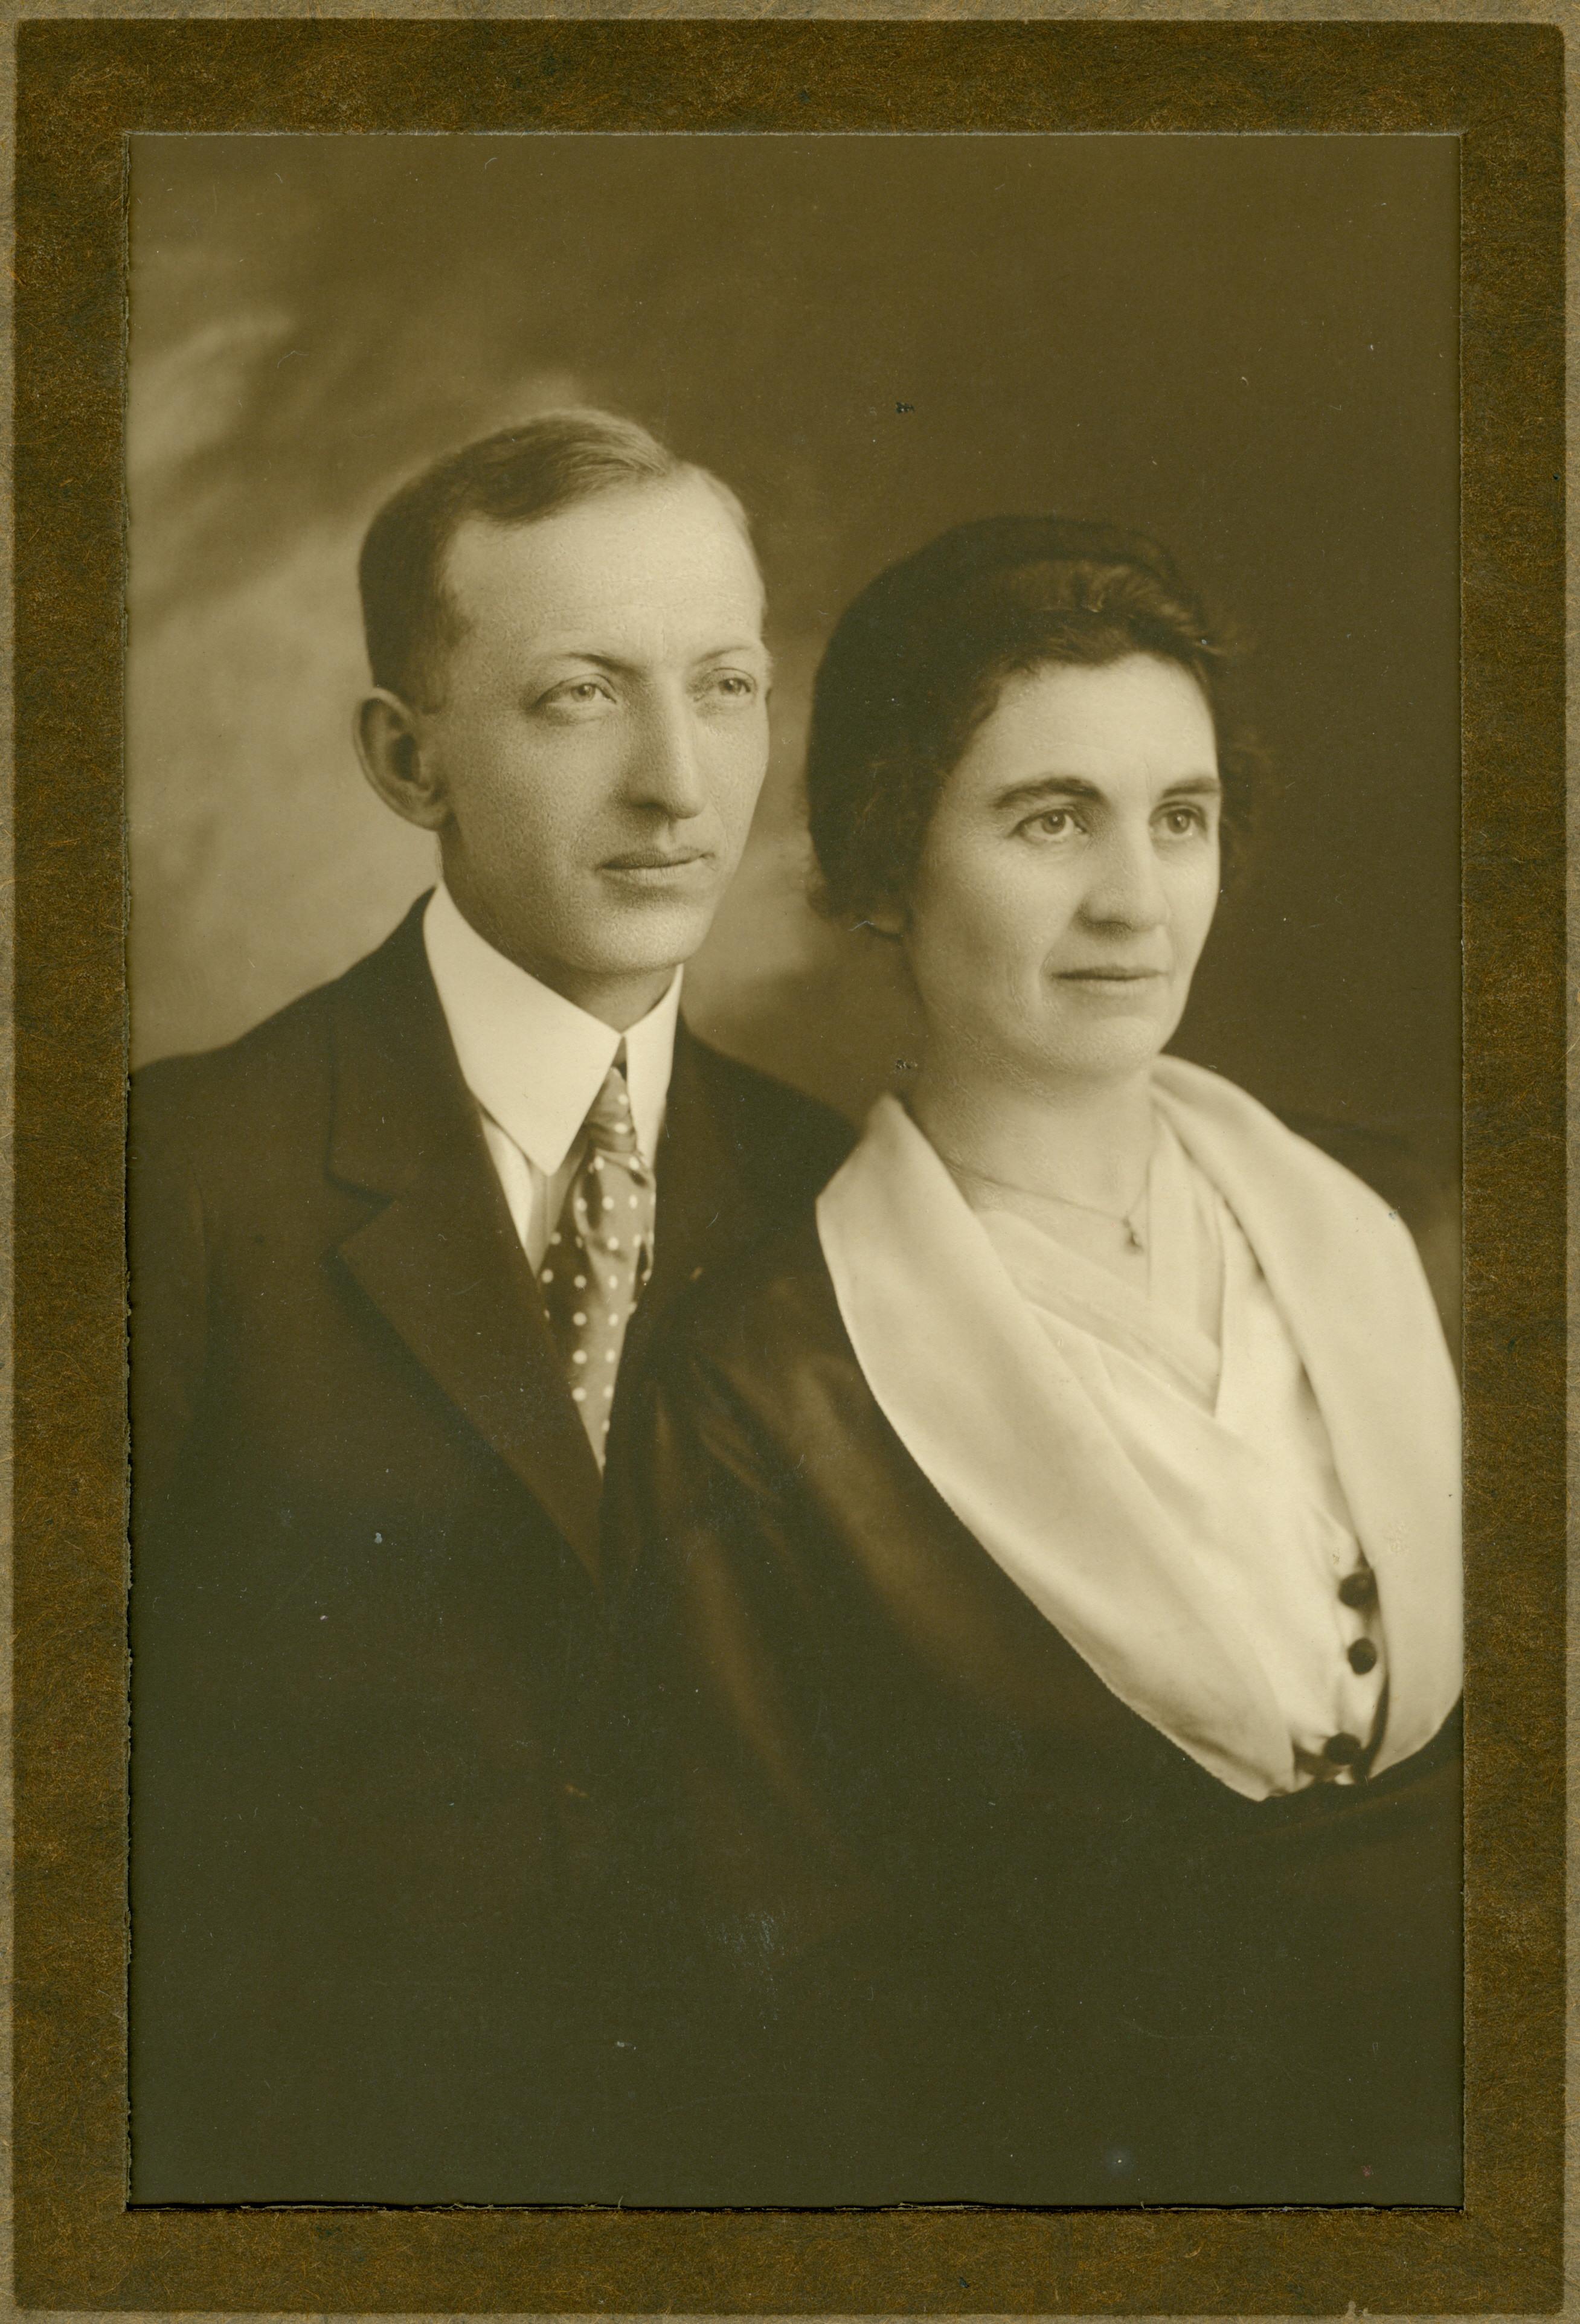 August Peters